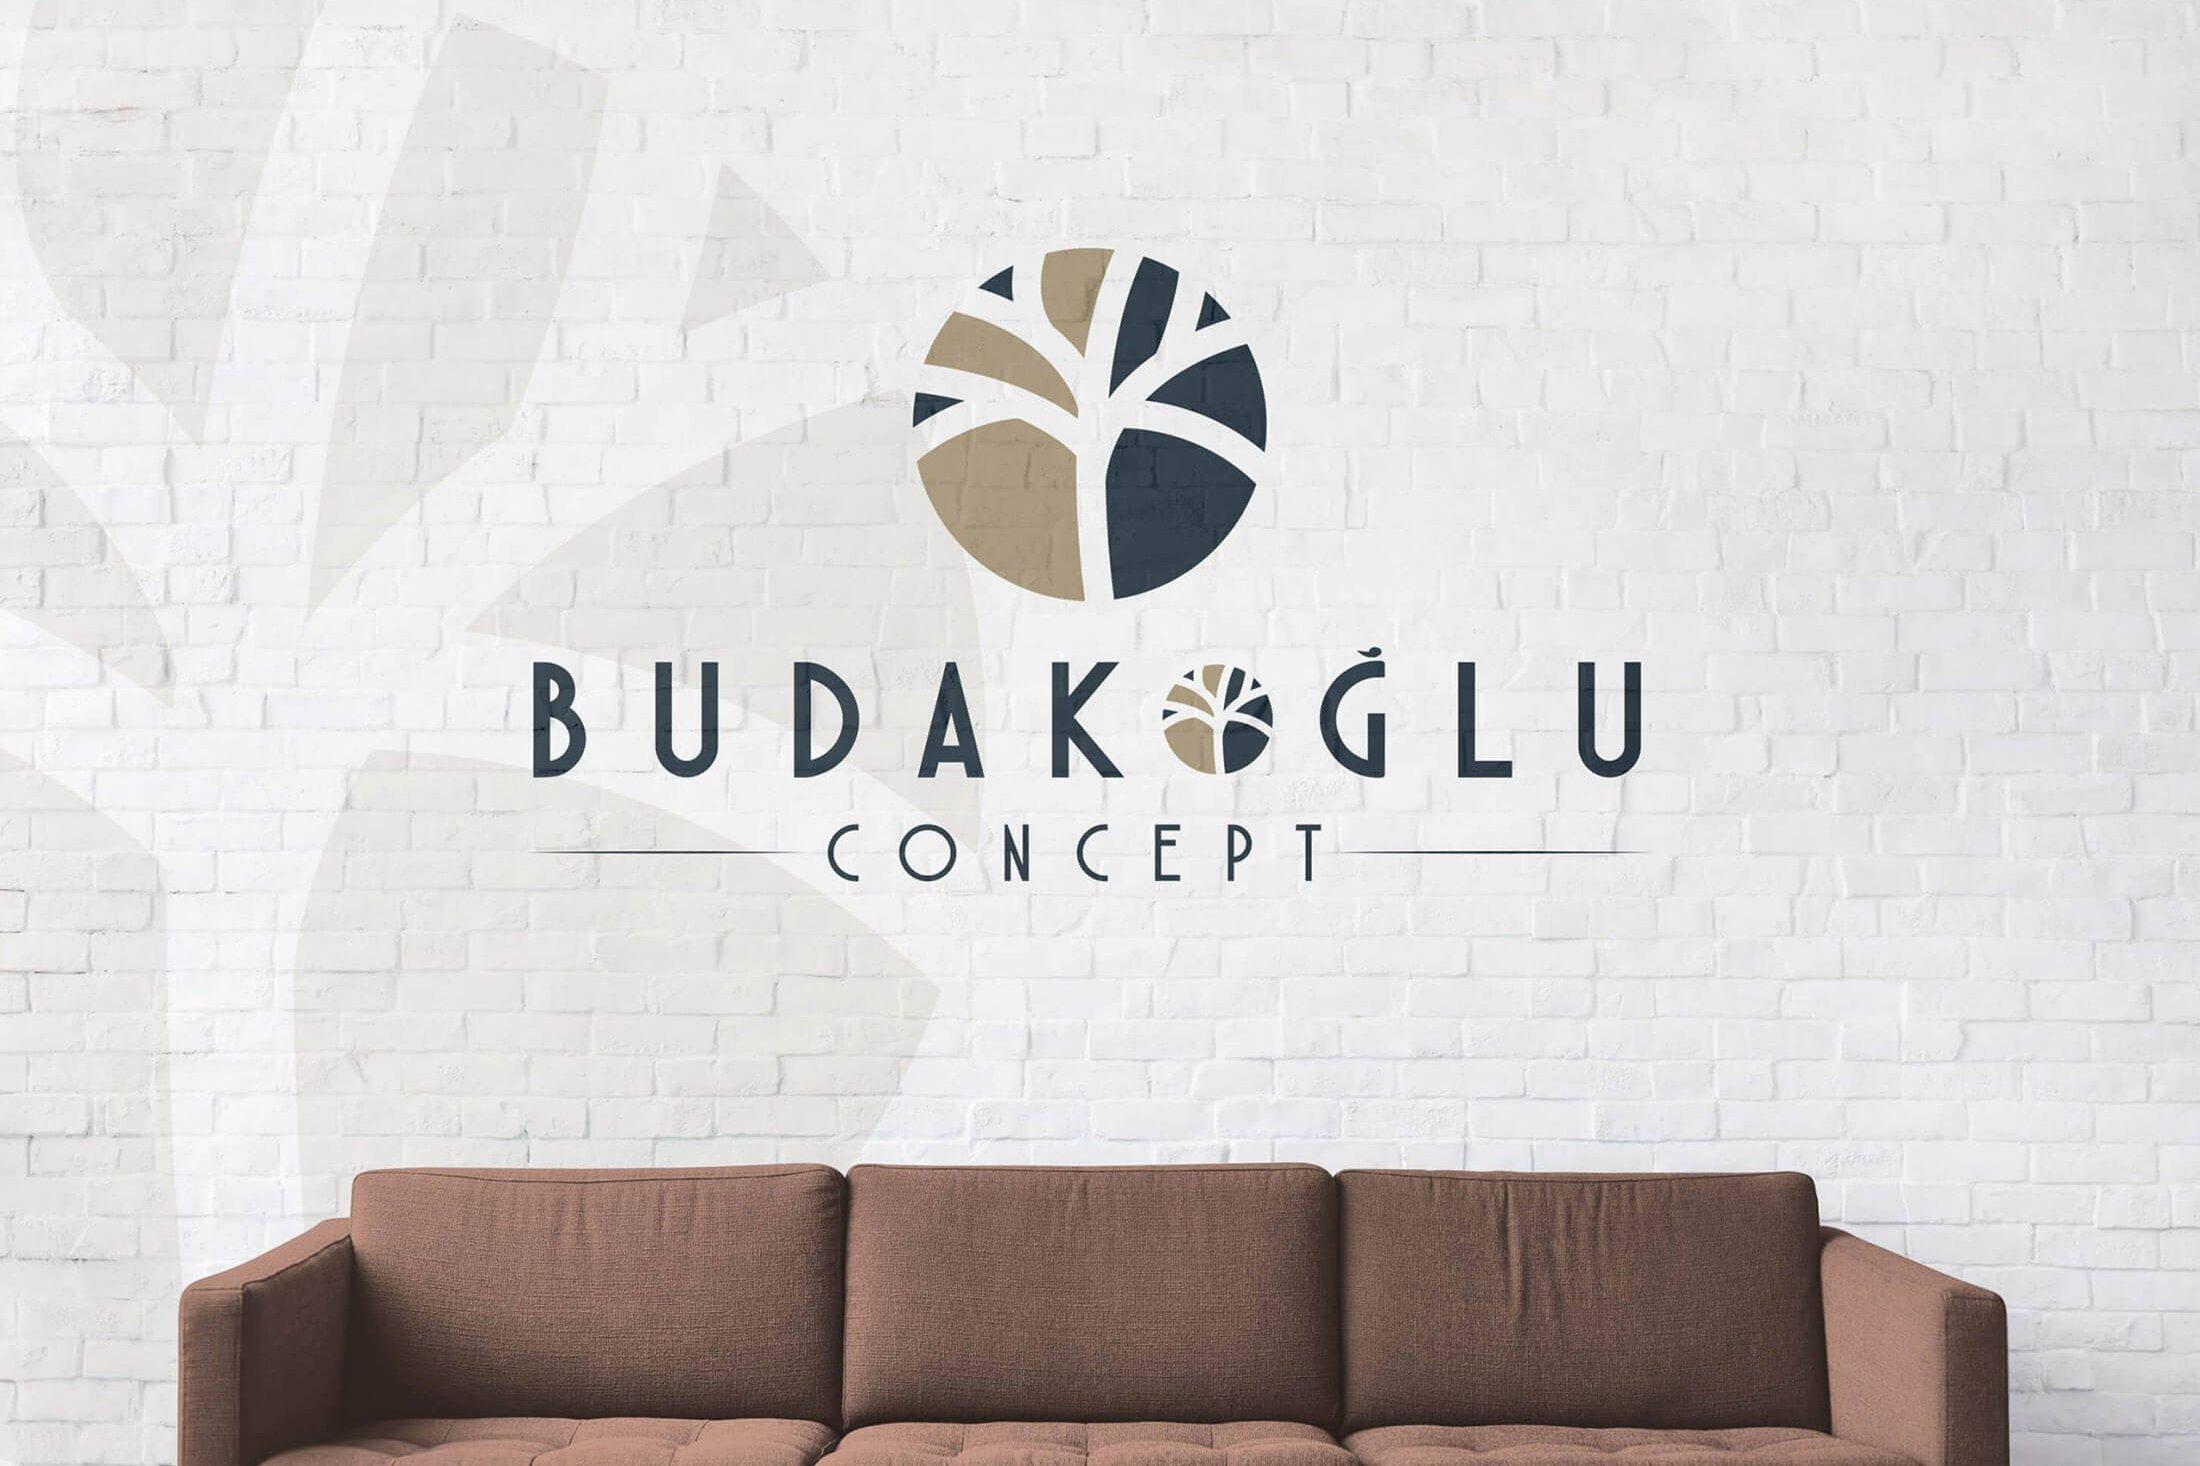 budakoglu concept 88medya 8